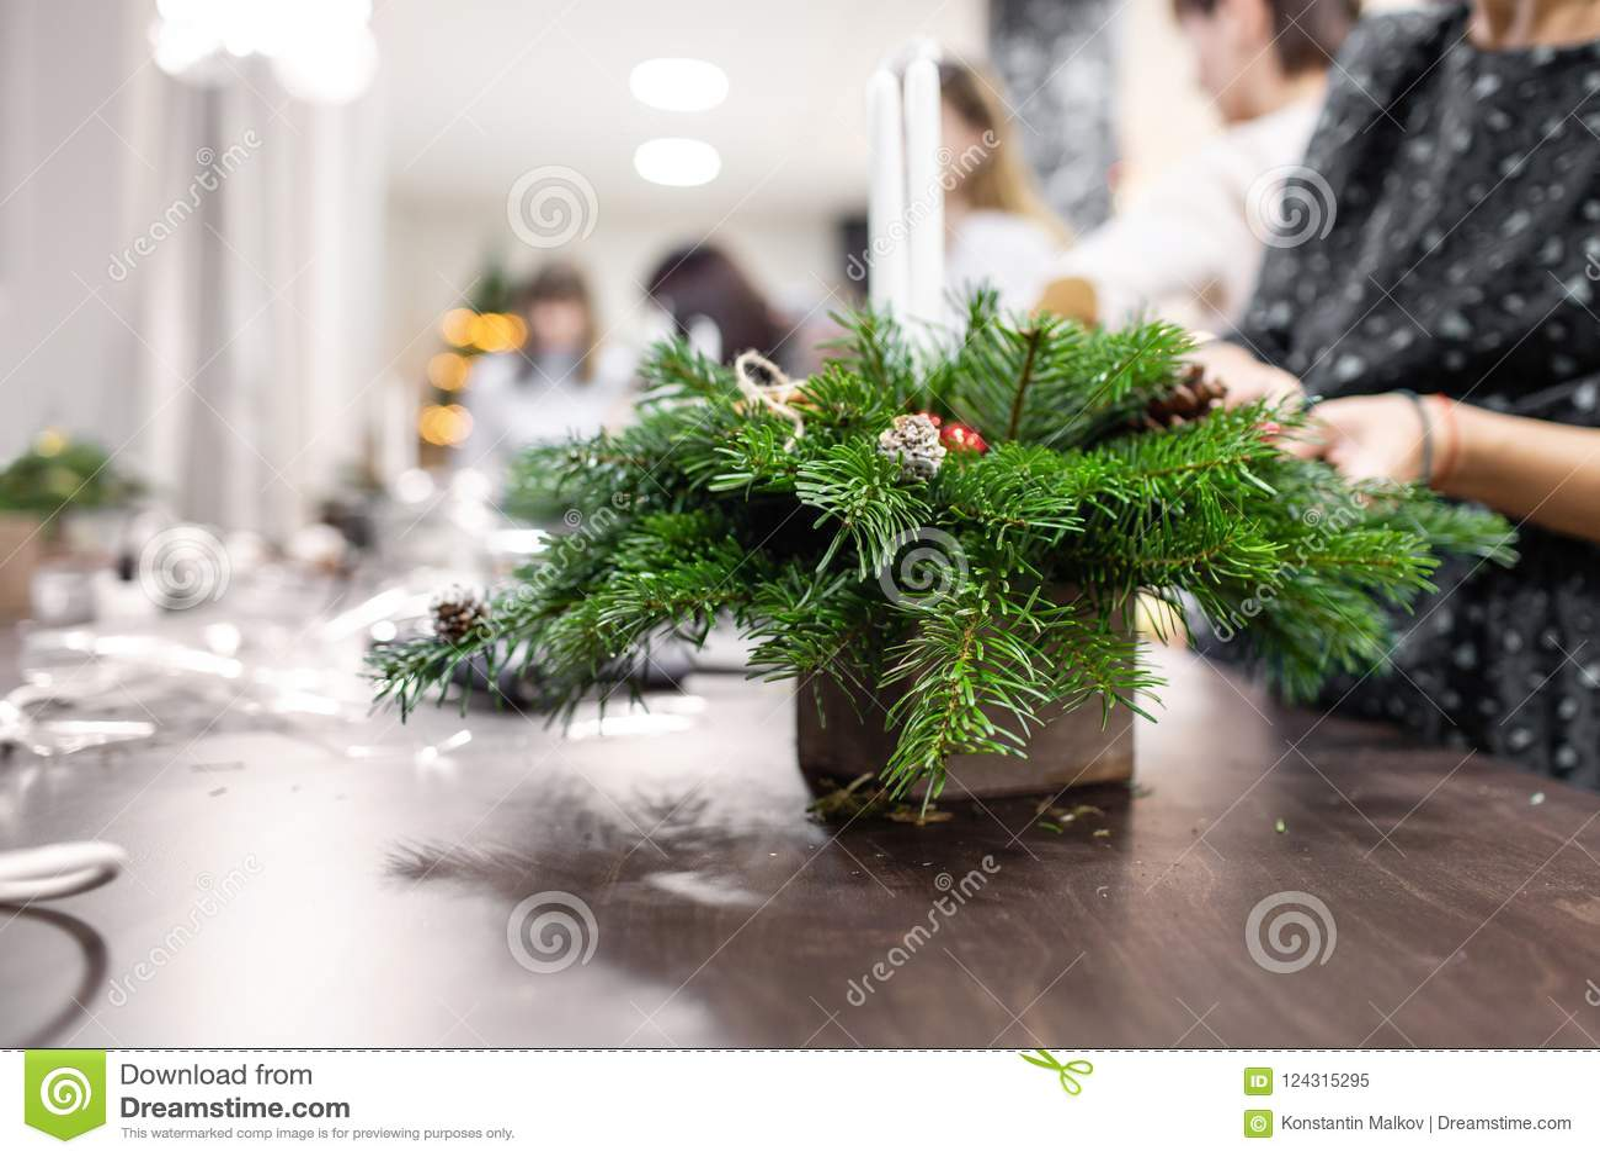 A Christmas Arrangement.A Woman Decorates A Christmas Arrangement With Candles